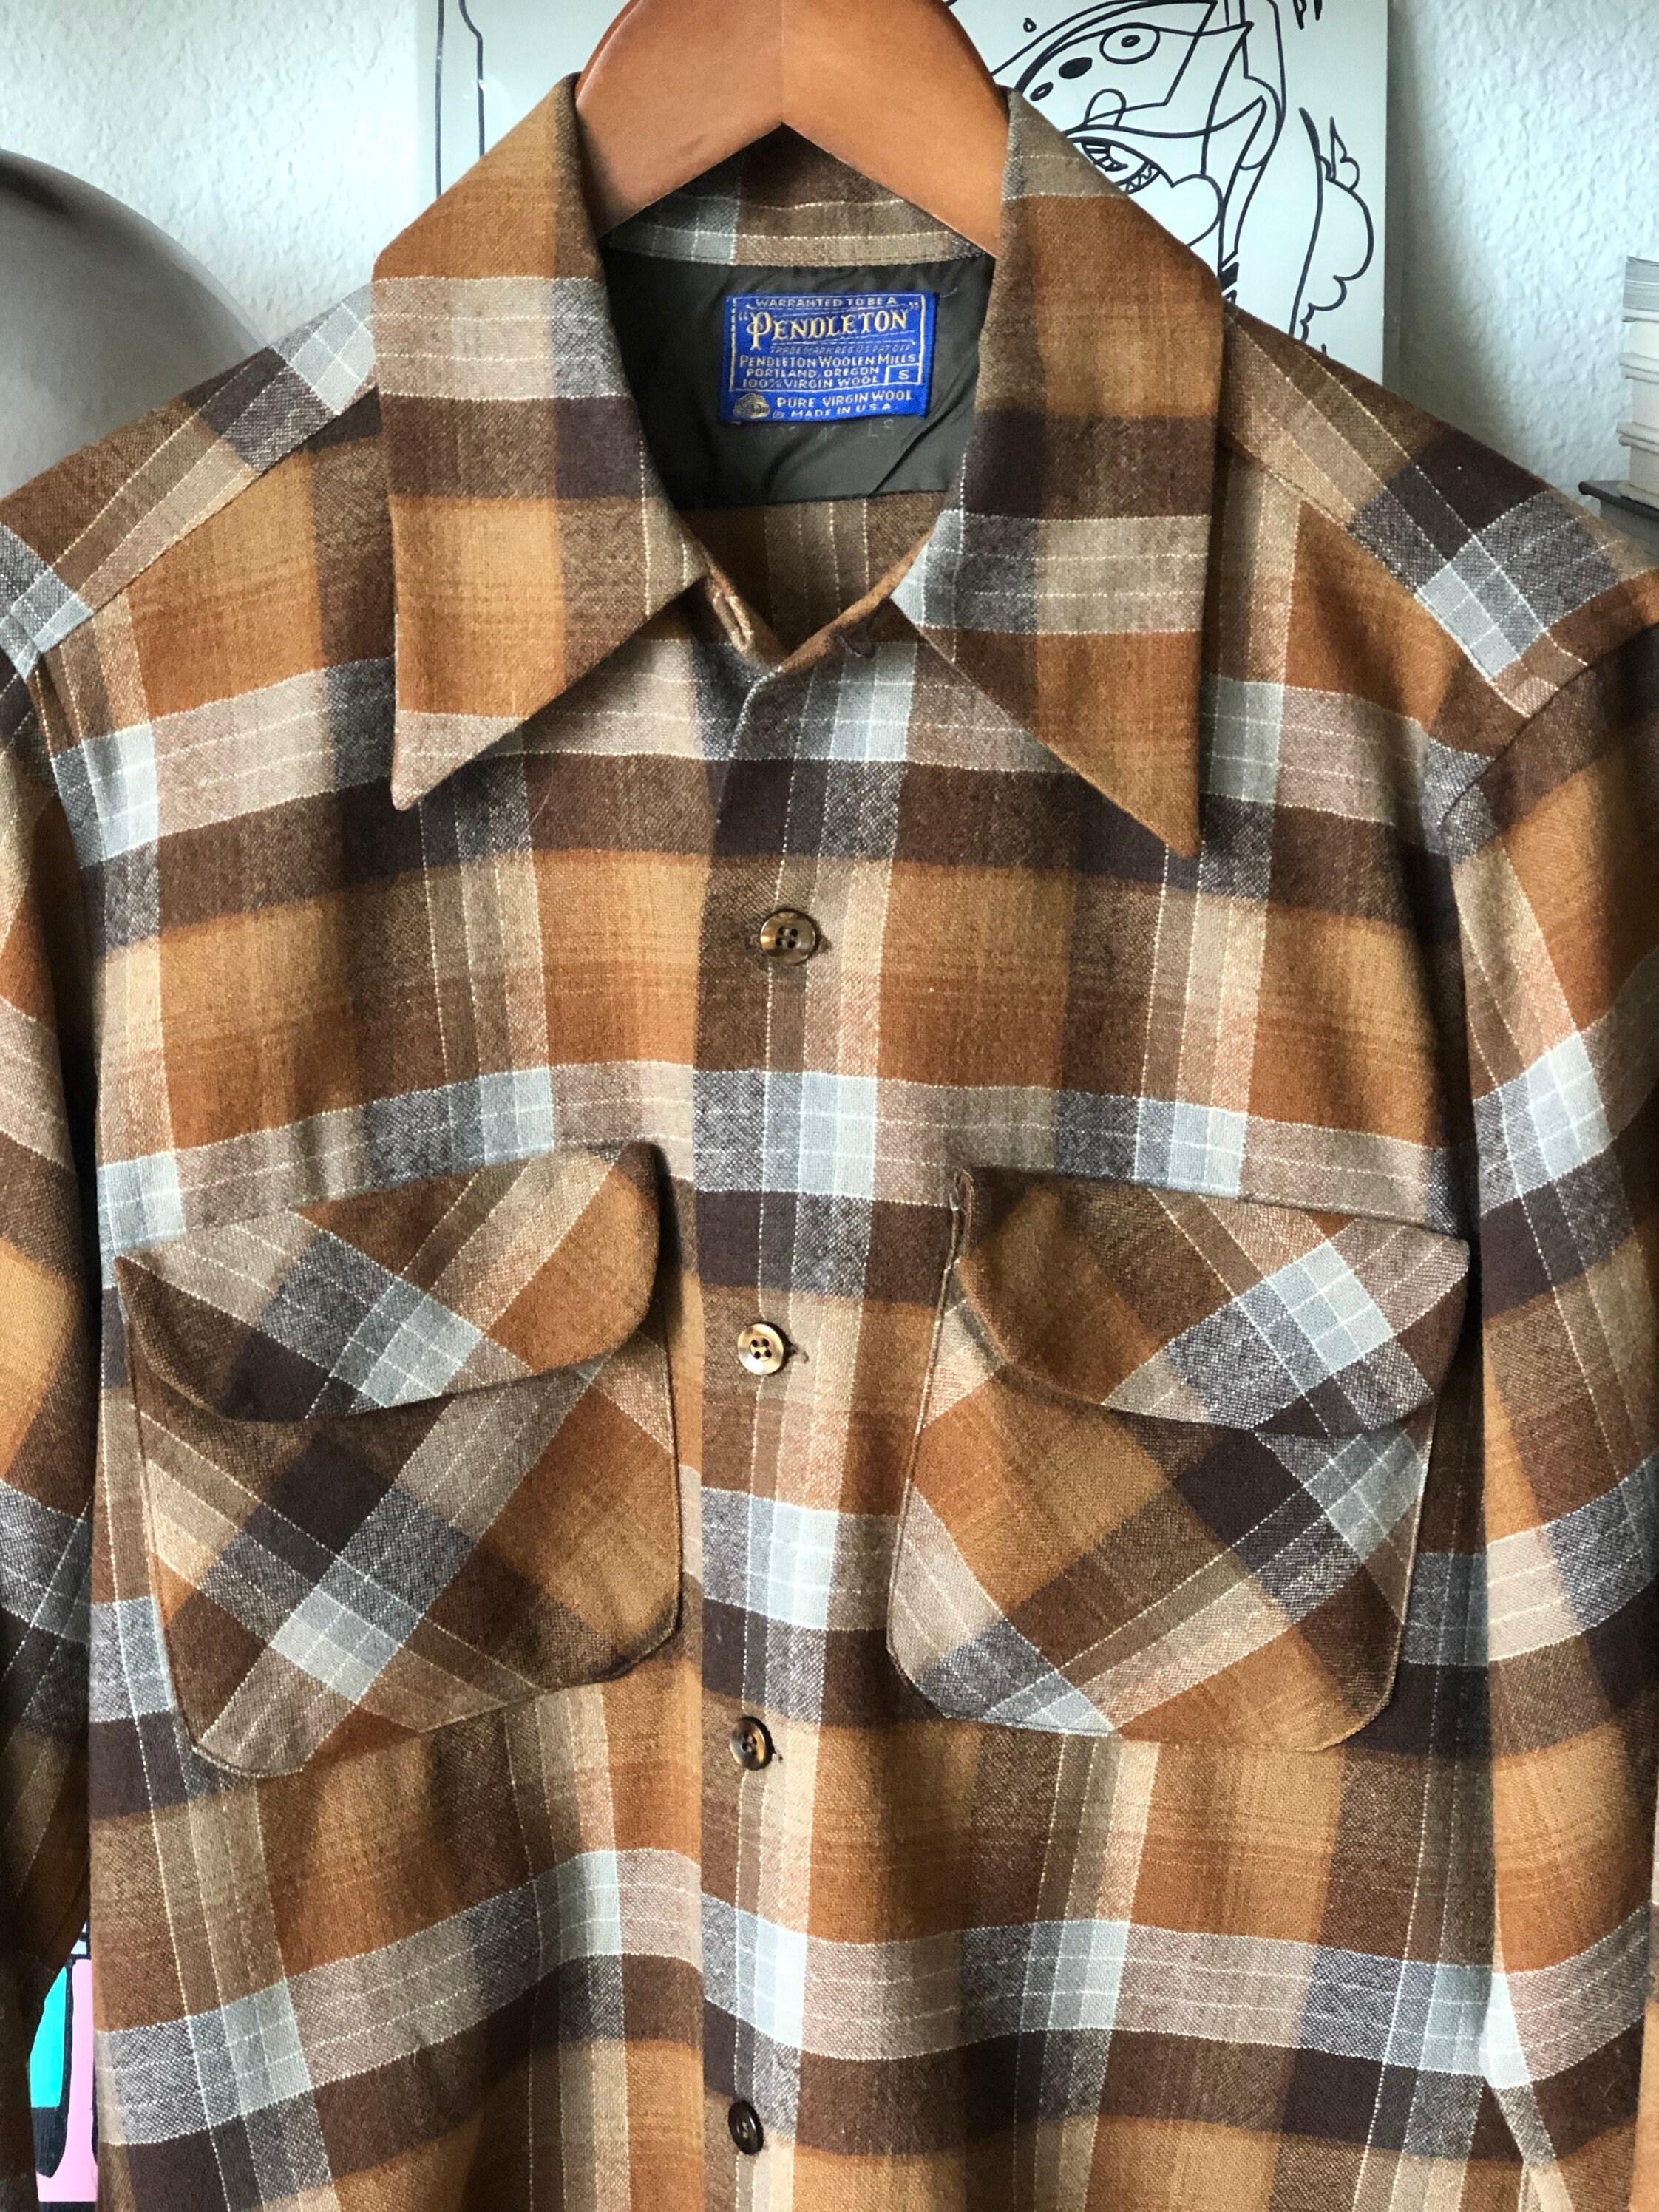 1950s Mens Hats | 50s Vintage Men's Hats Vintage Pendleton S Mens Brown Plaid Wool Flannel Shirt Loop Collar Flap Pockets 1950S Rockabilly 50S Grunge 60S Man 1960S Unisex 38 Chest $8.00 AT vintagedancer.com